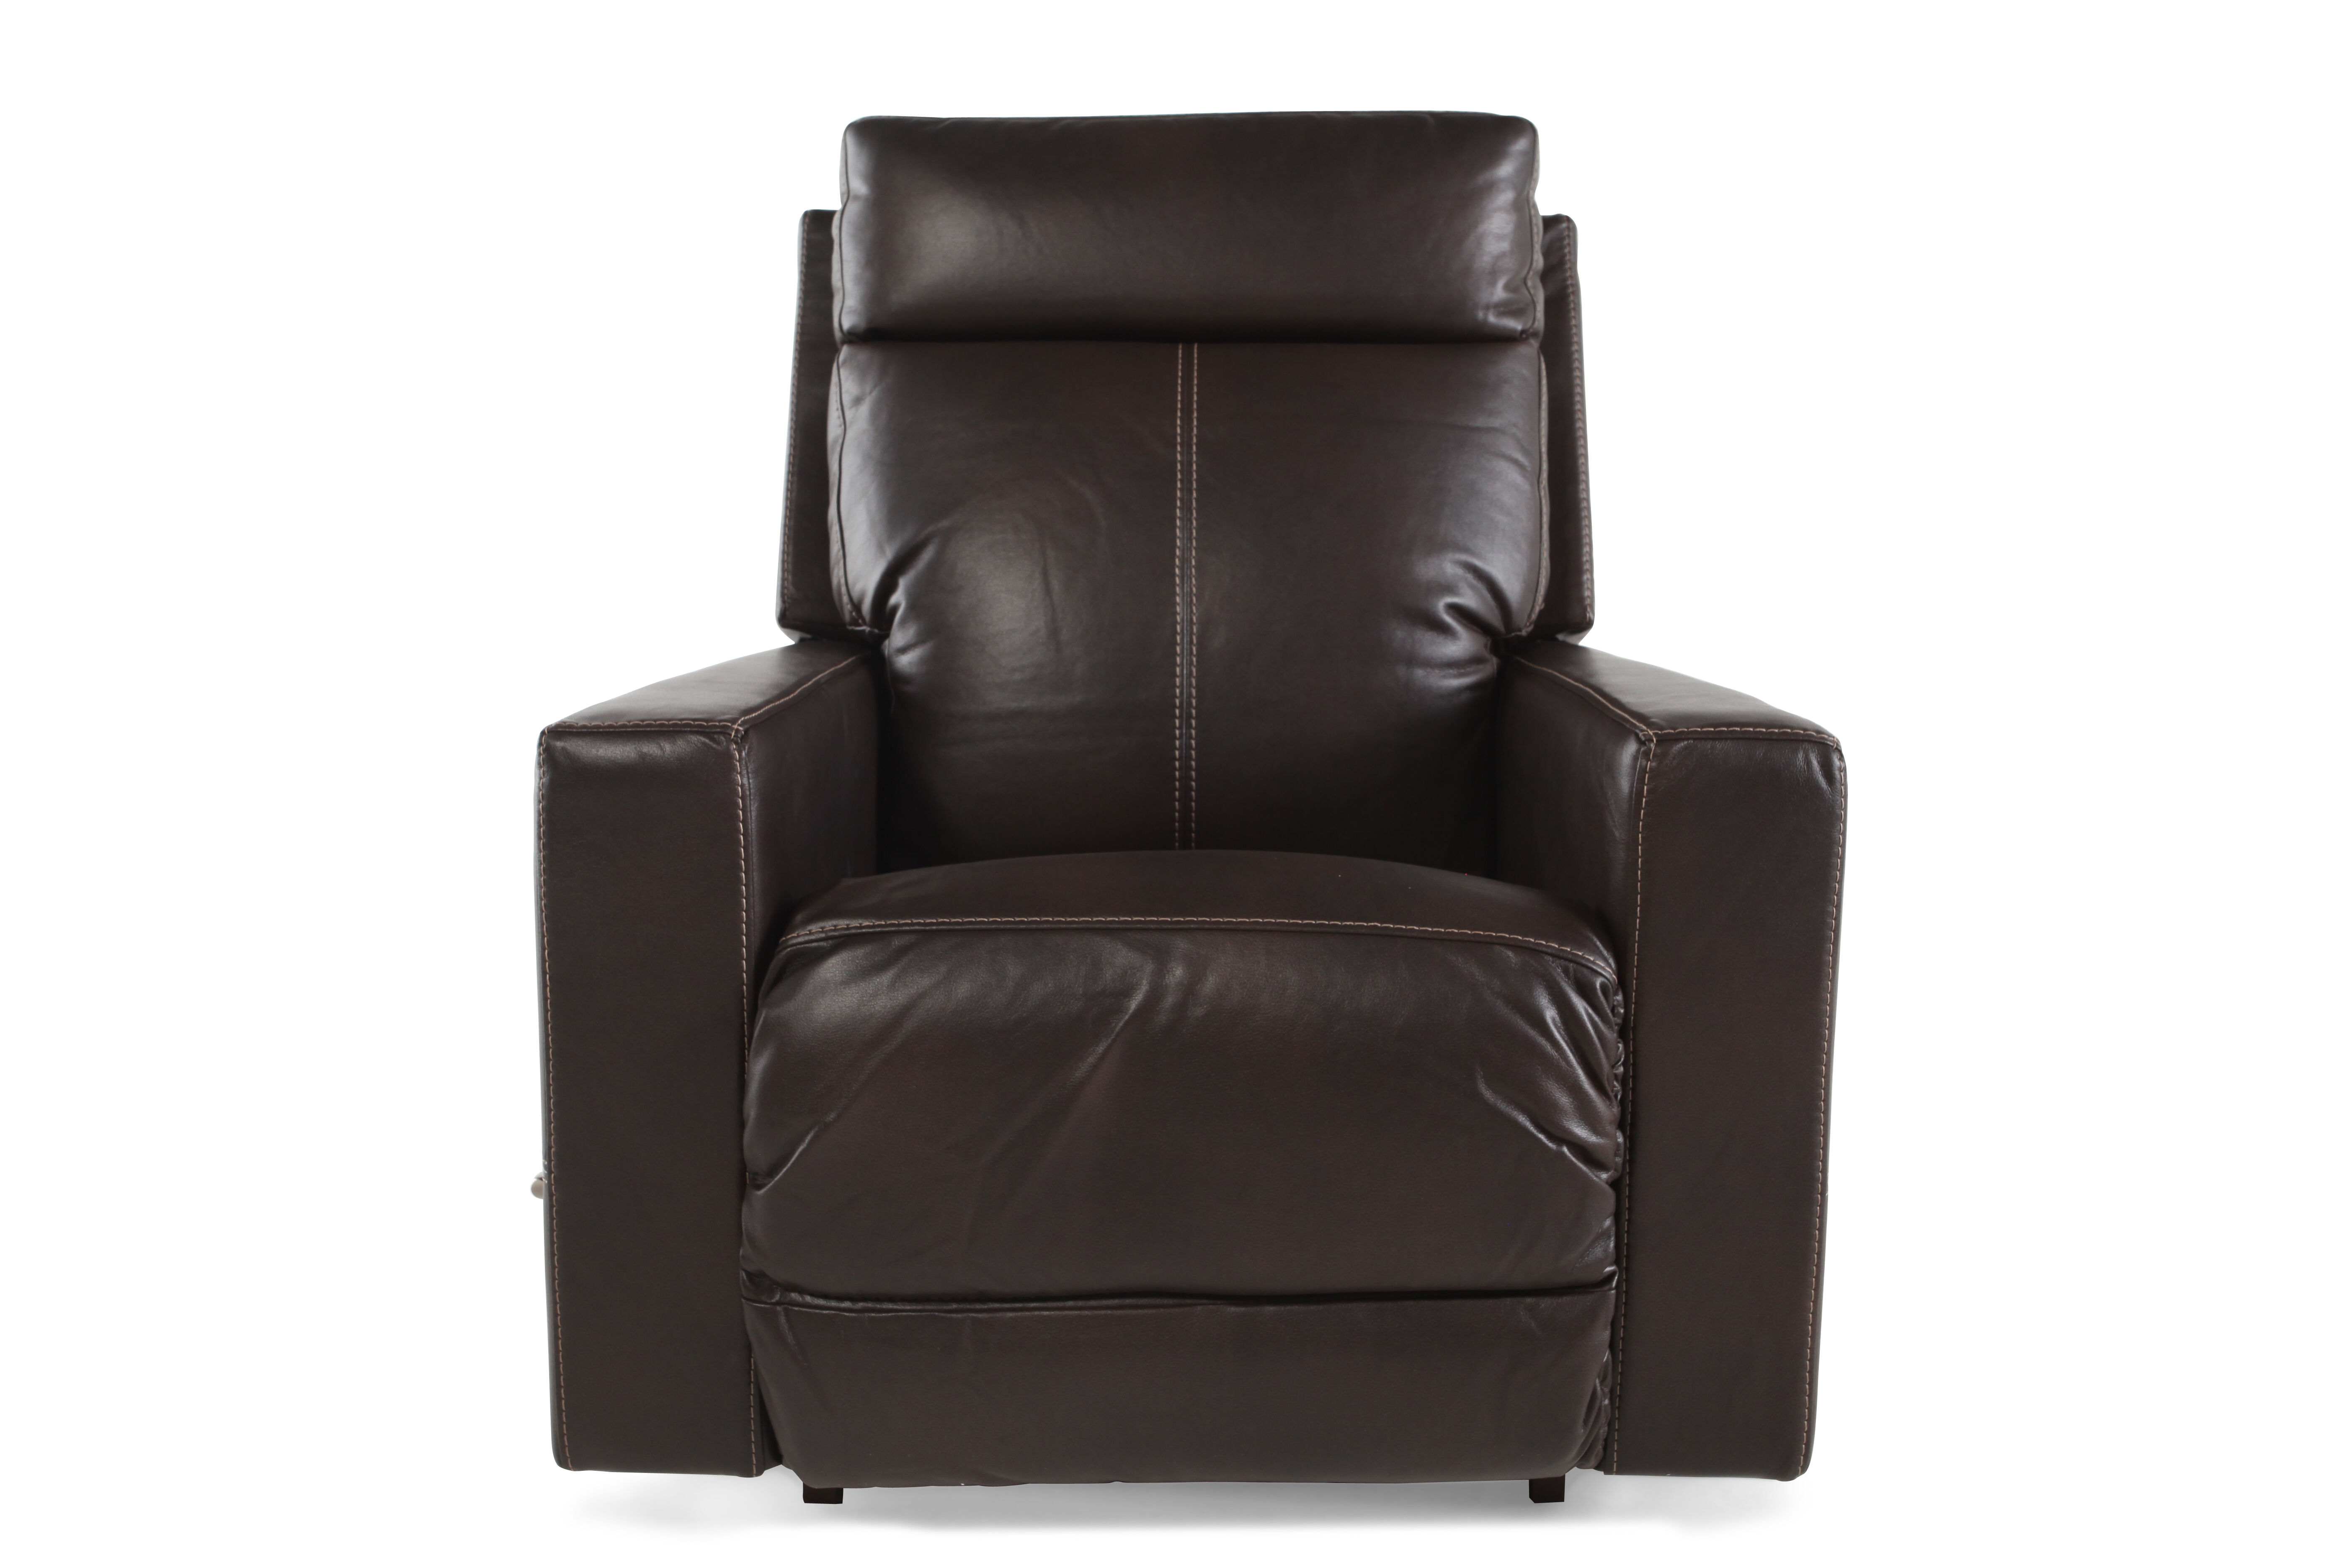 La-Z-Boy Jax Sable Leather Recliner  sc 1 st  Mathis Brothers & La-Z-Boy Jax Sable Leather Recliner | Mathis Brothers Furniture islam-shia.org